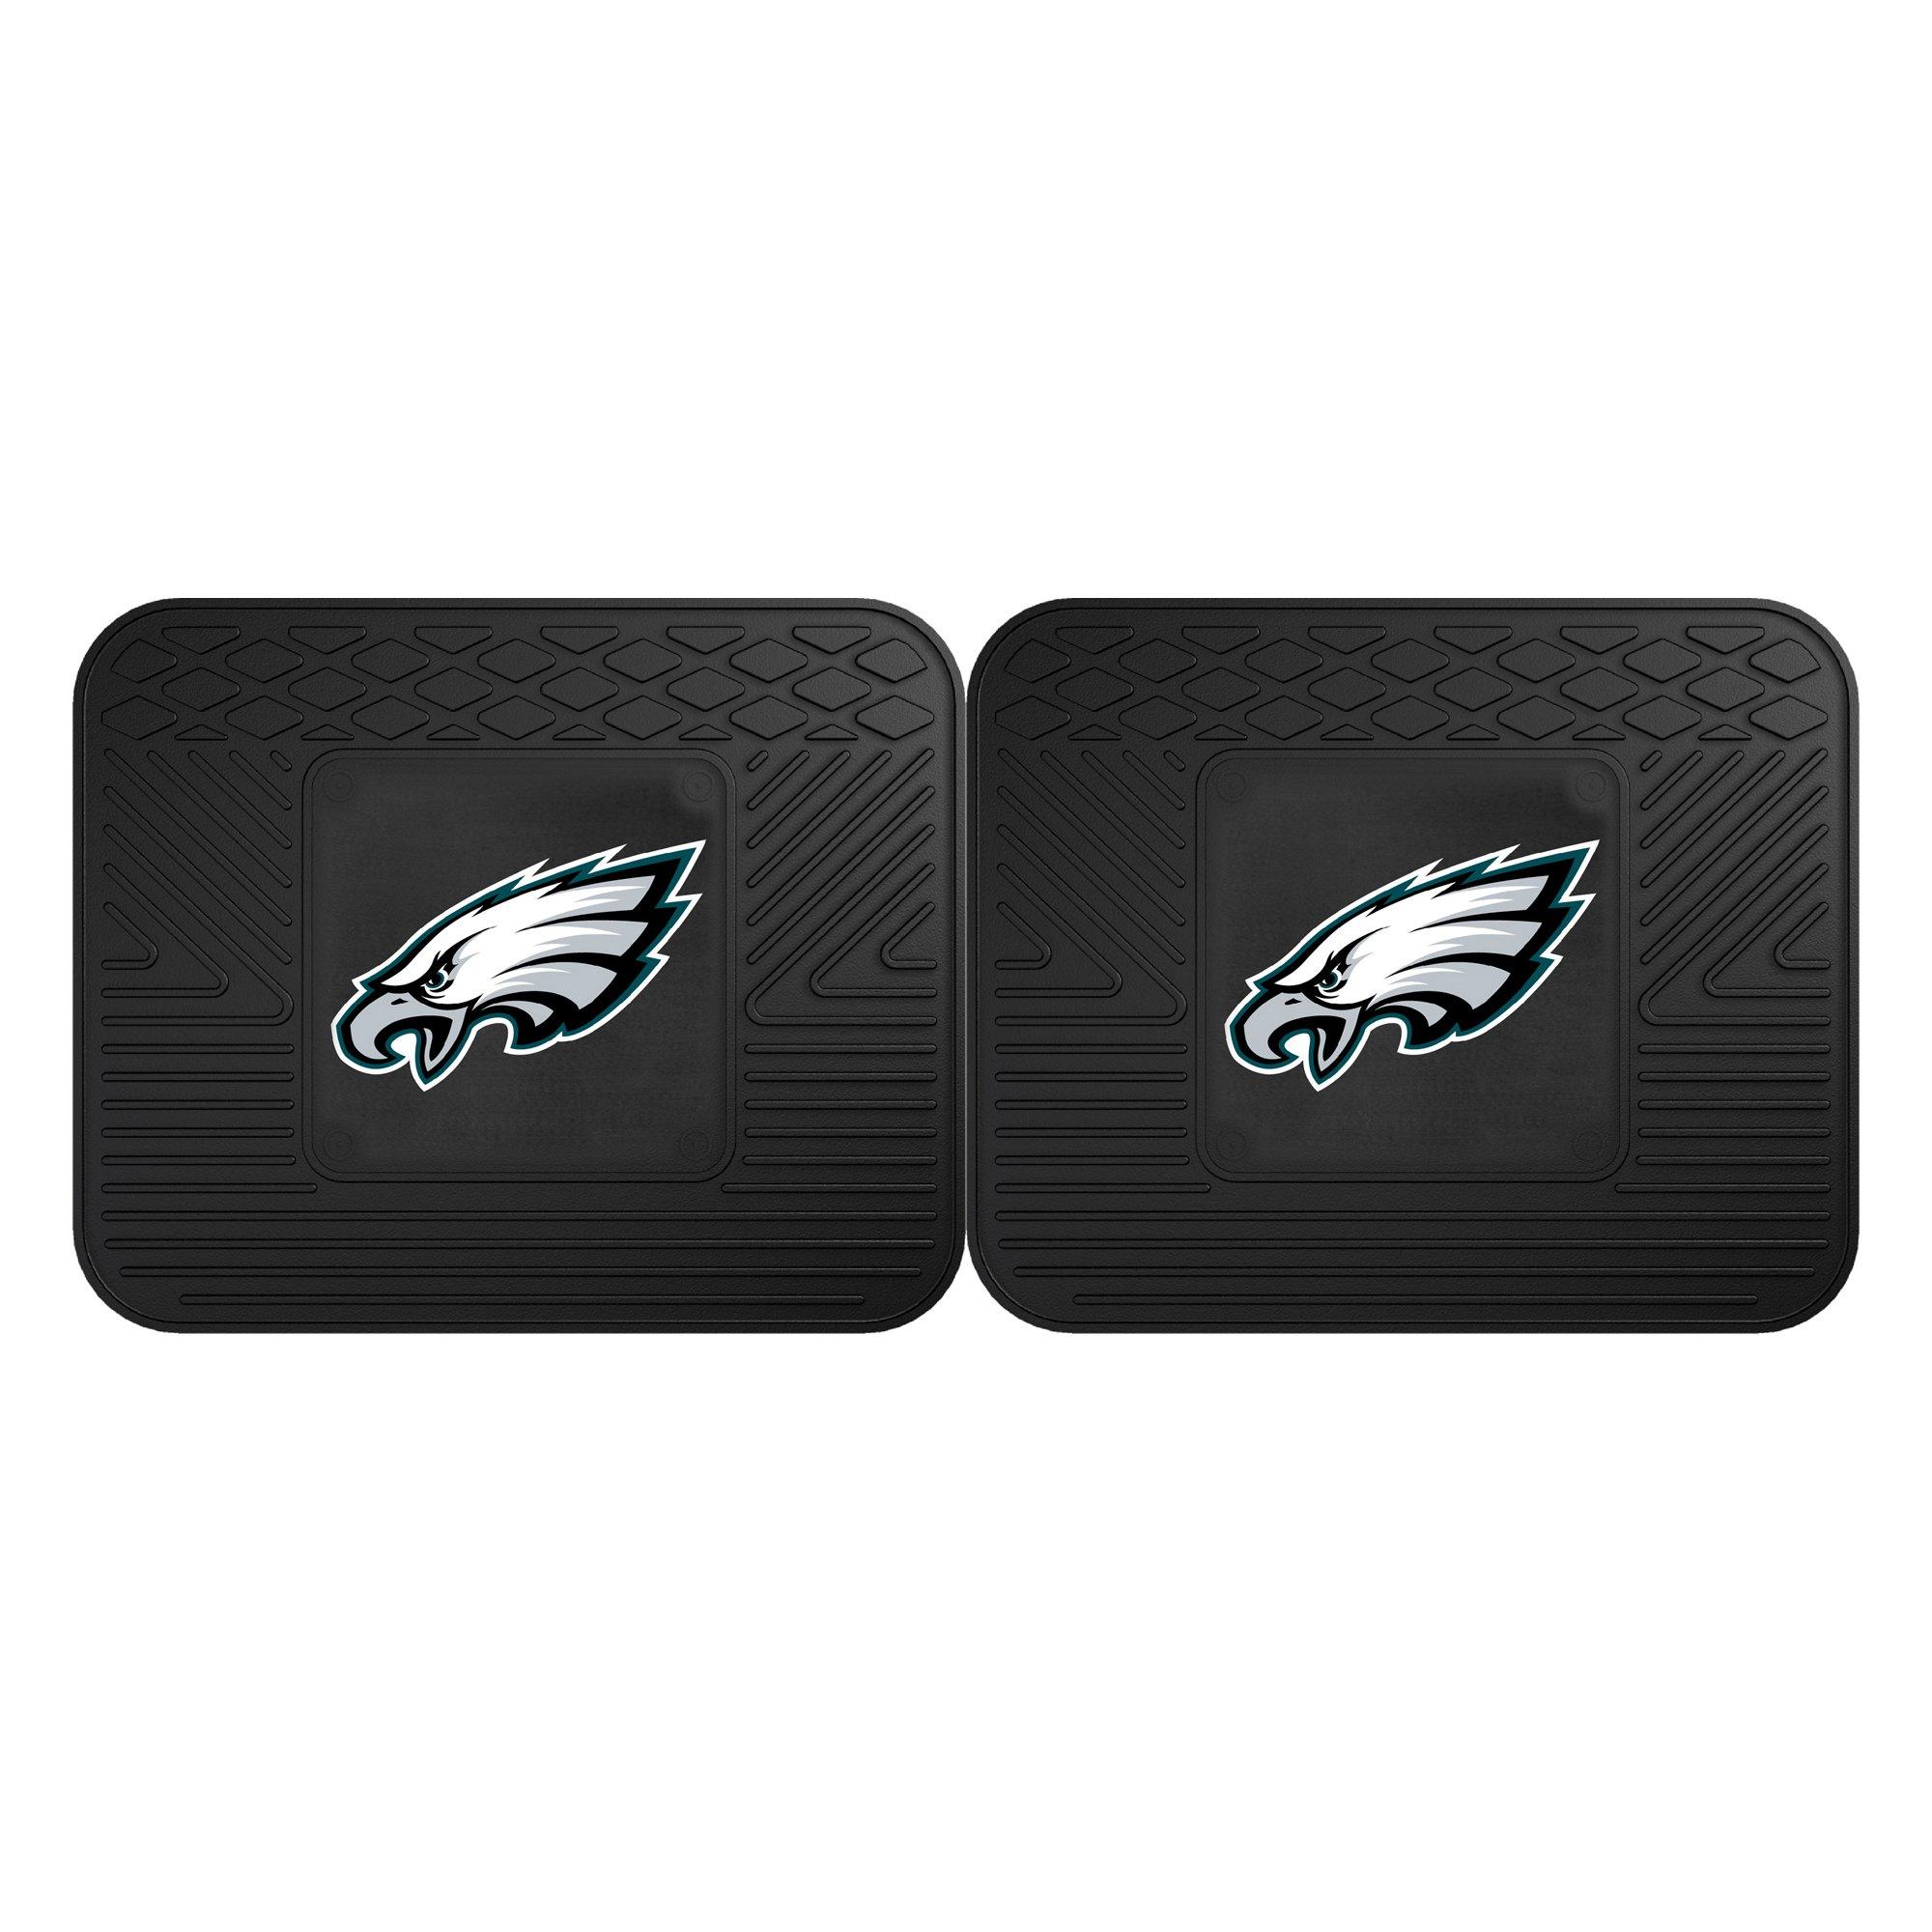 Fanmats 12315 NFL - Philadelphia Eagles Utility Mat - 2 Piece